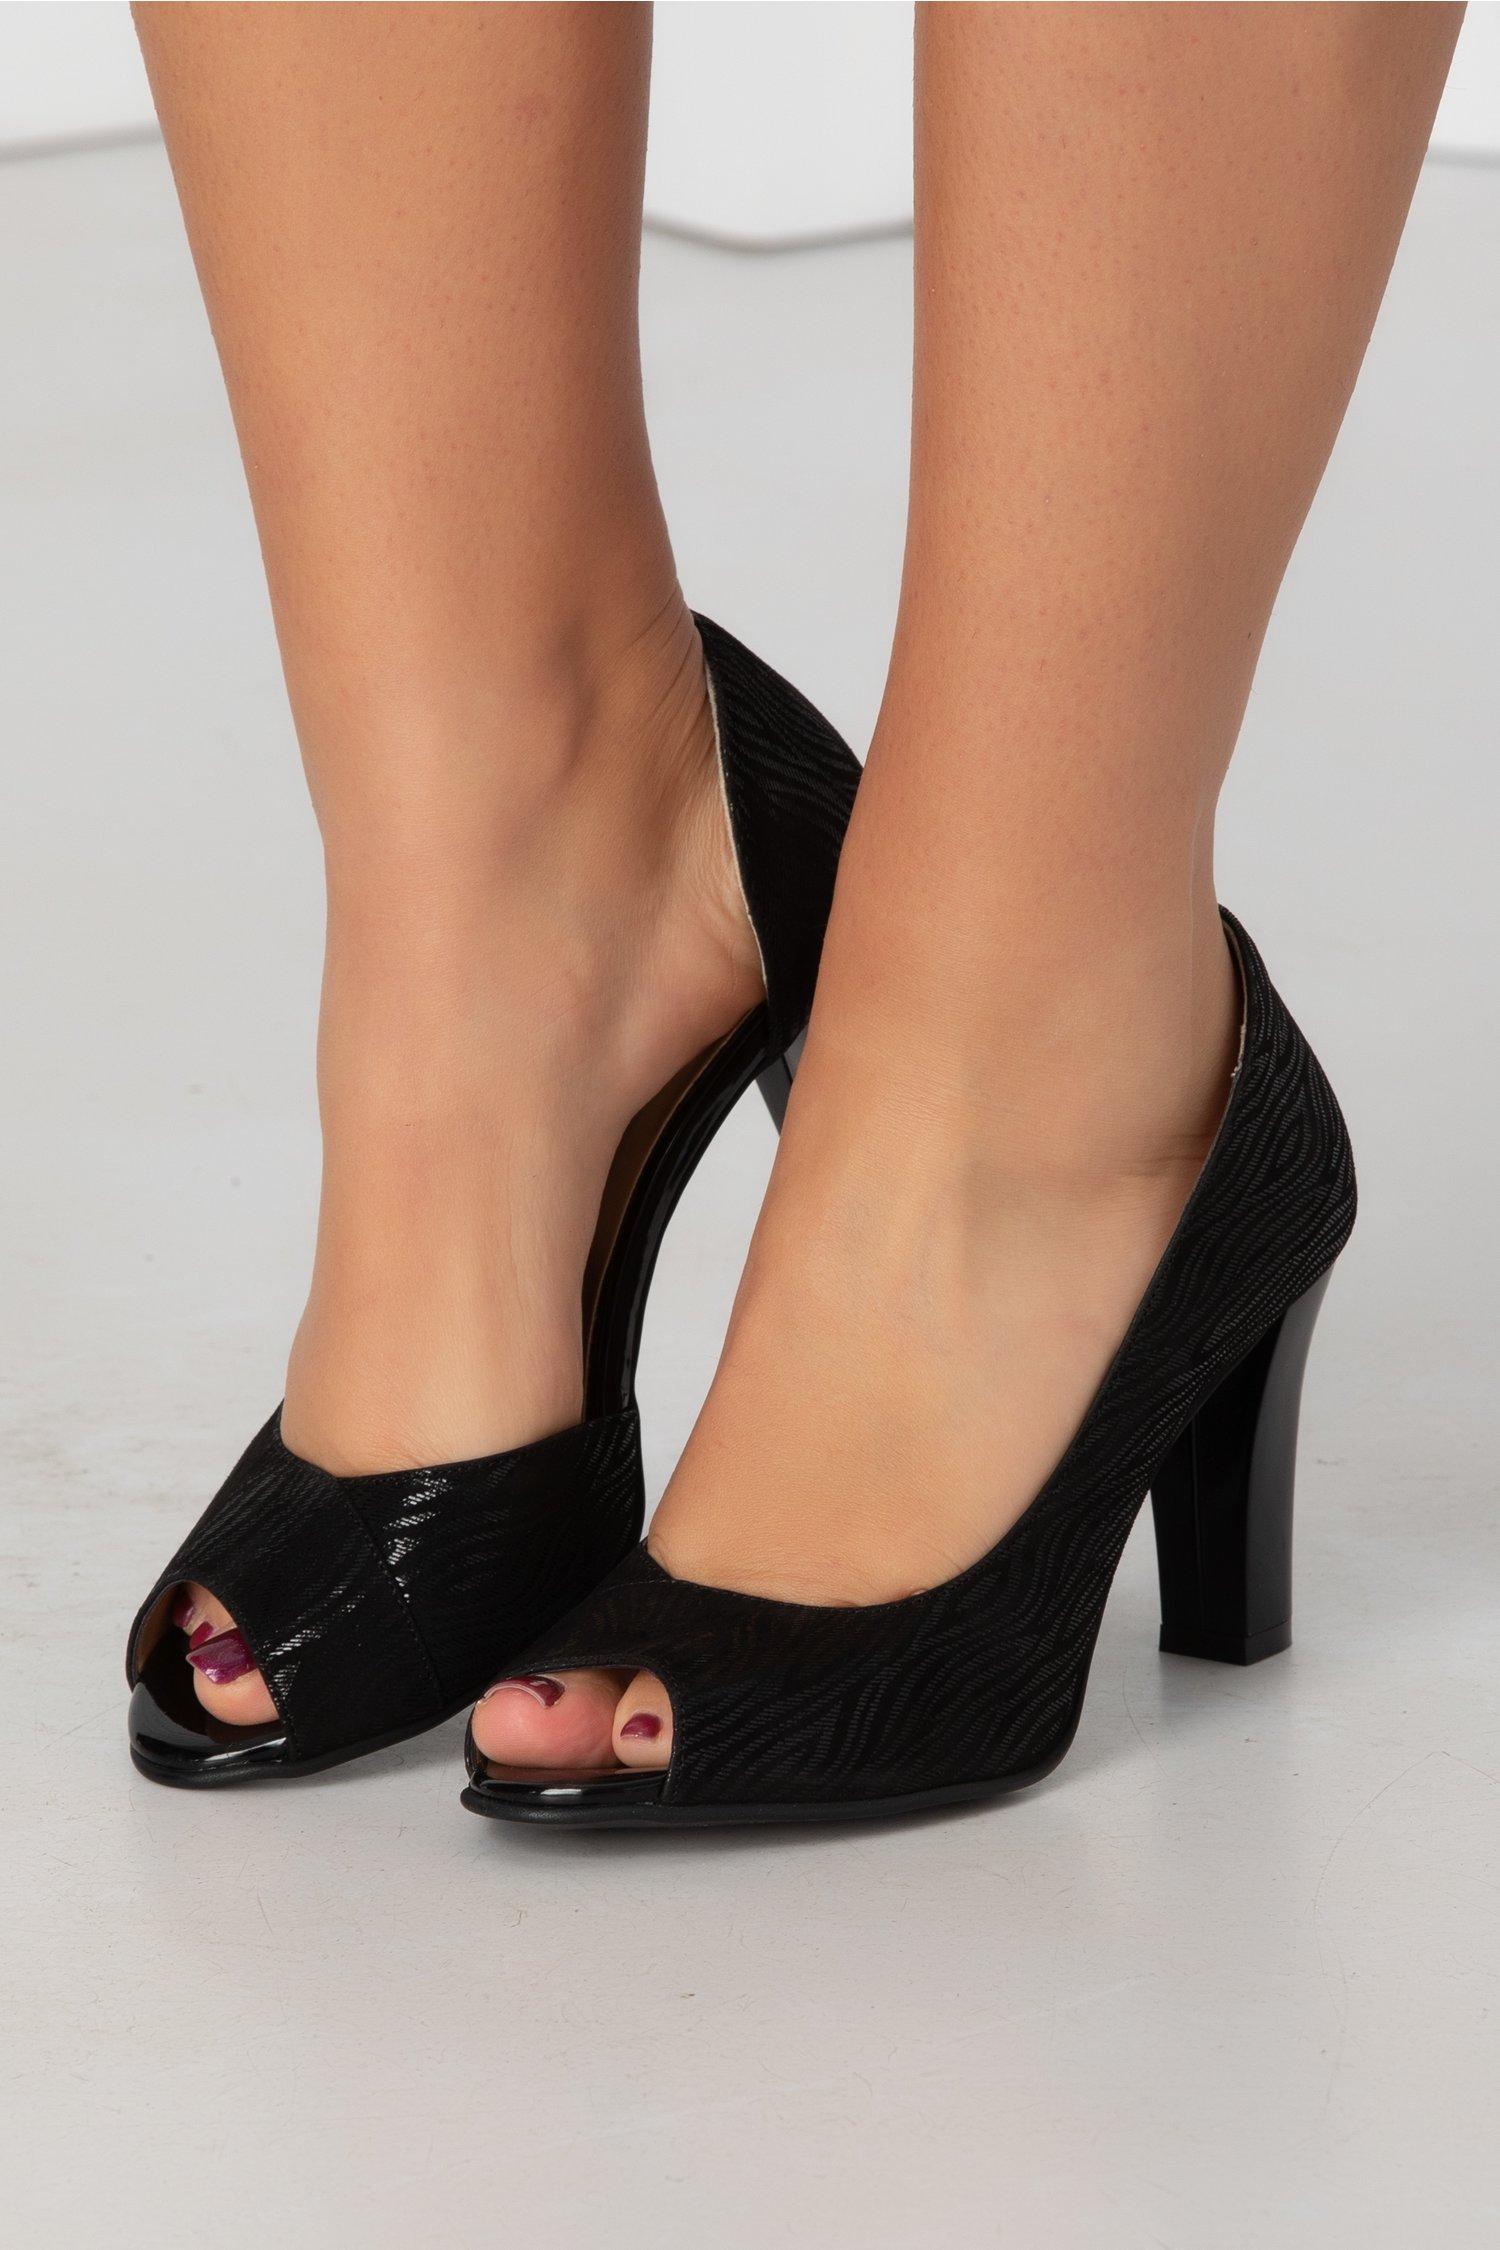 Pantofi negri cu insertii metalizate si decupaj la varf